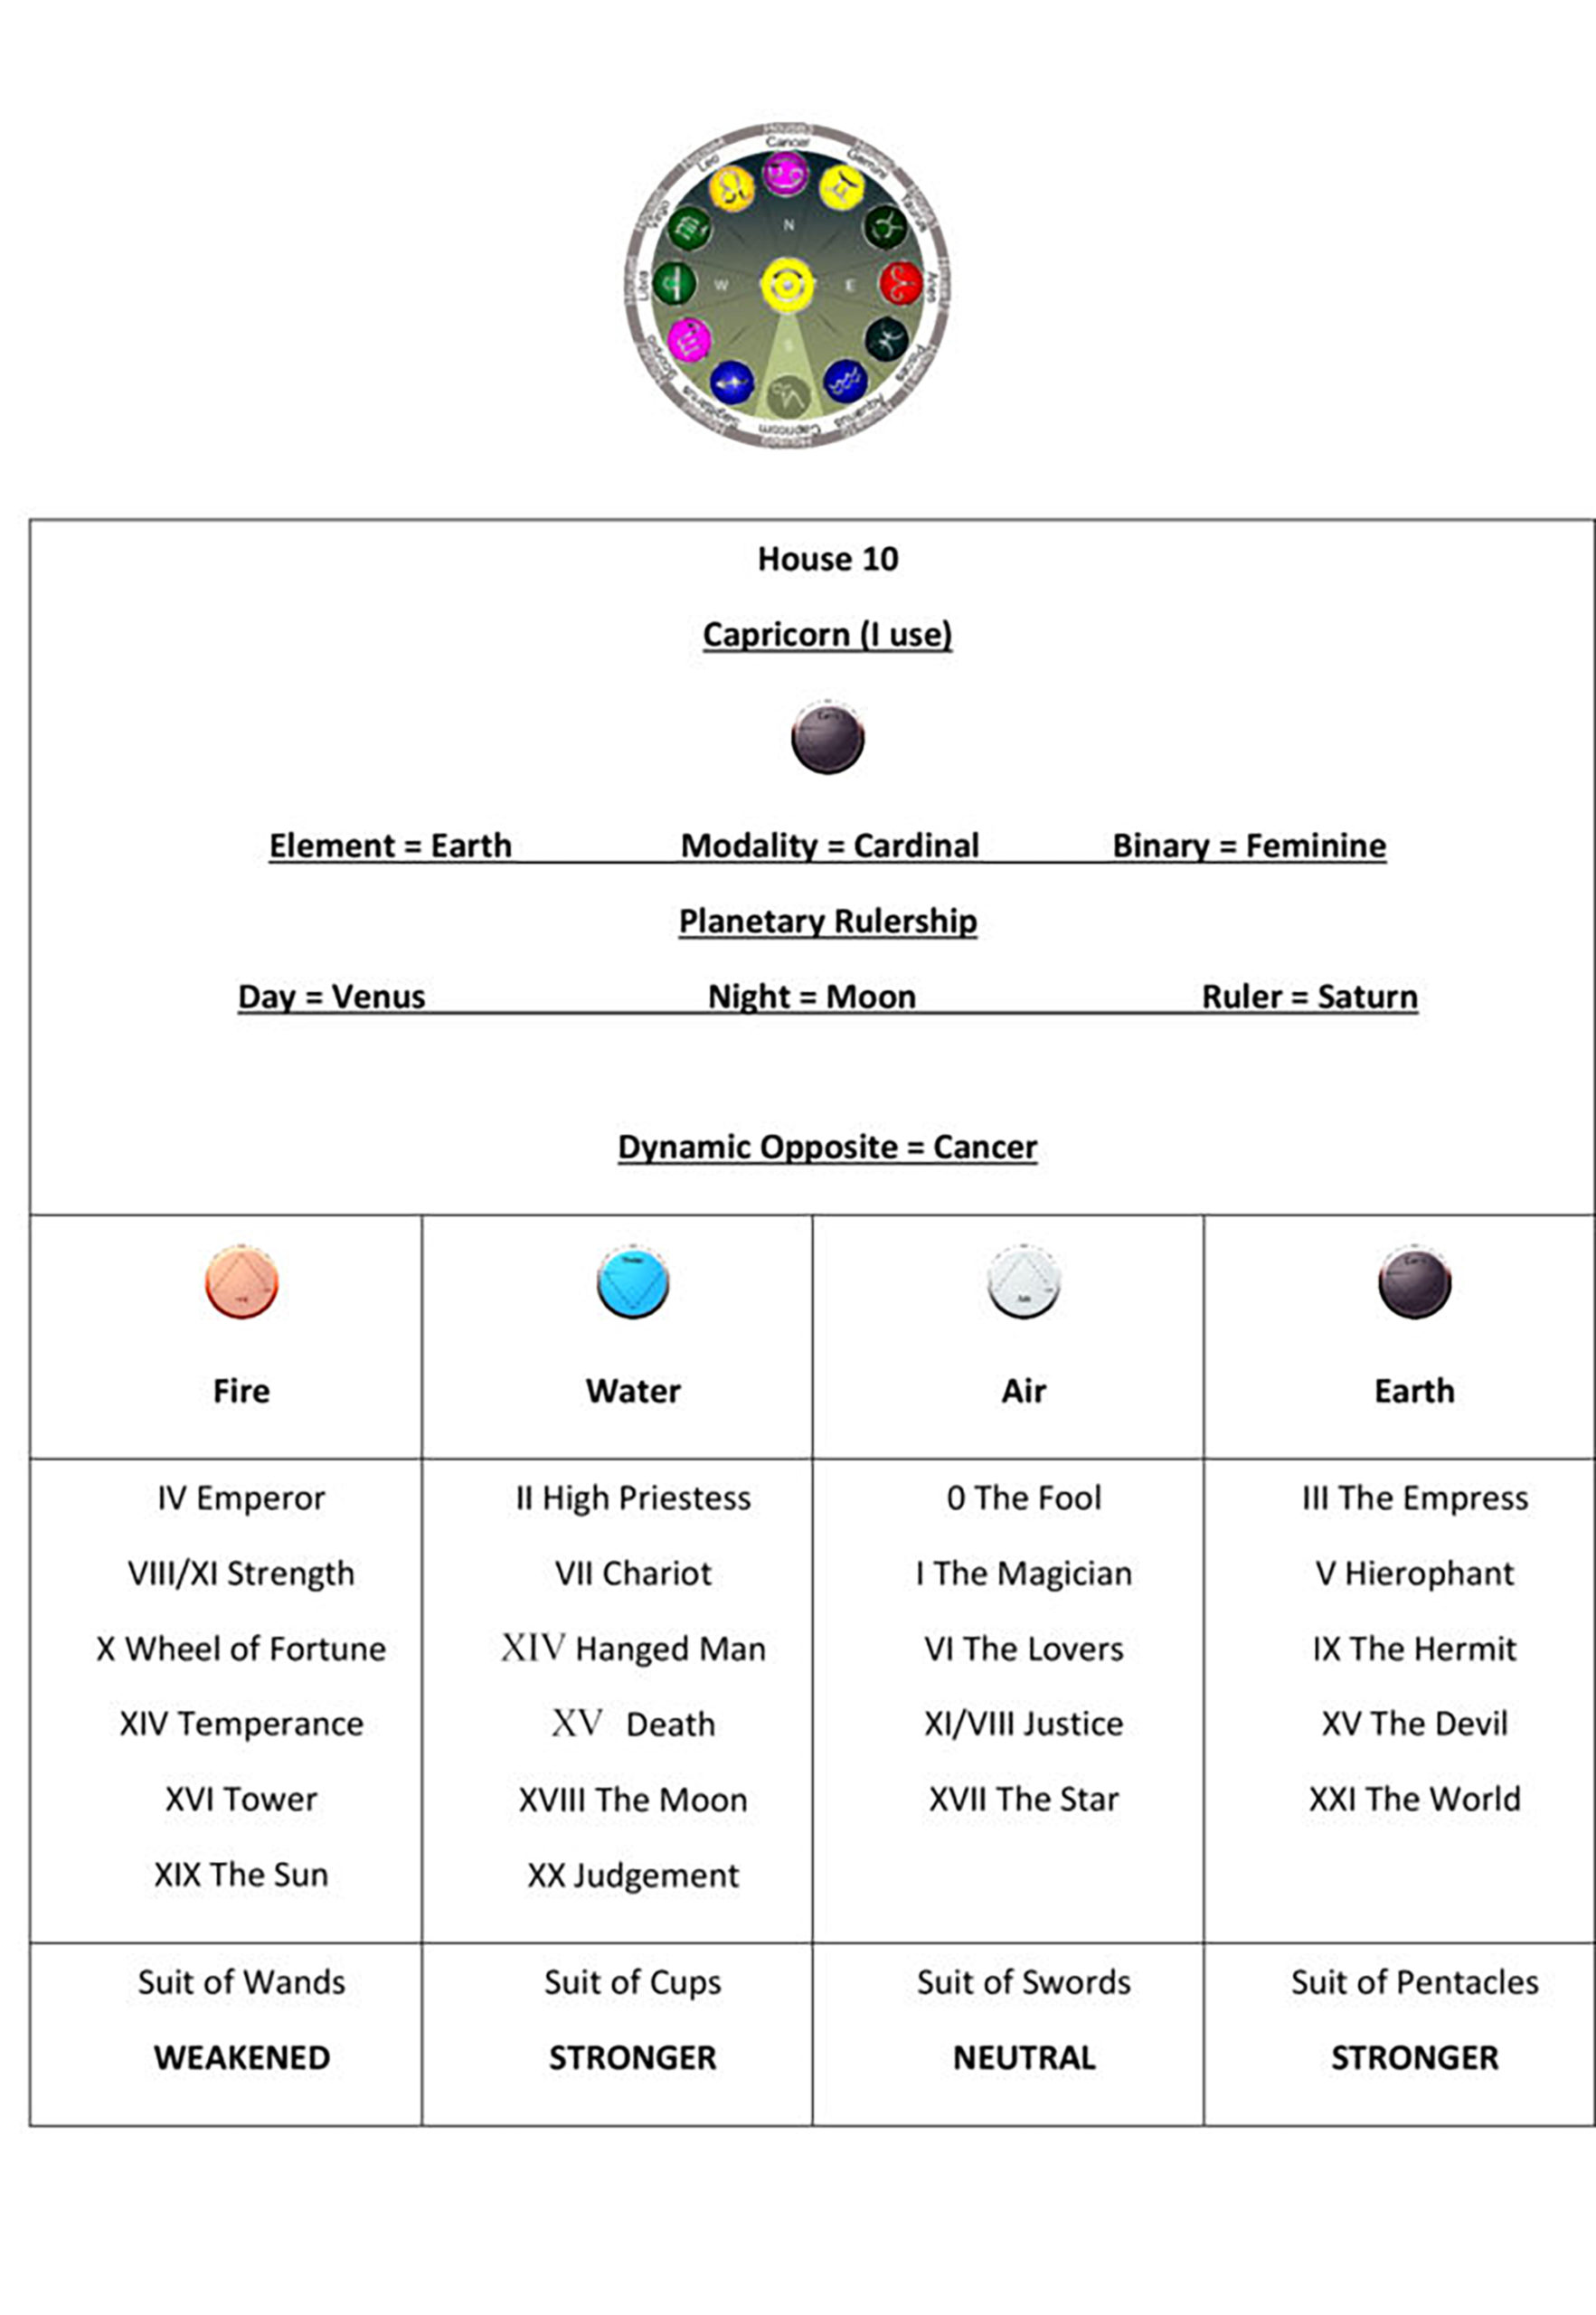 Astrology House 10 Chart1